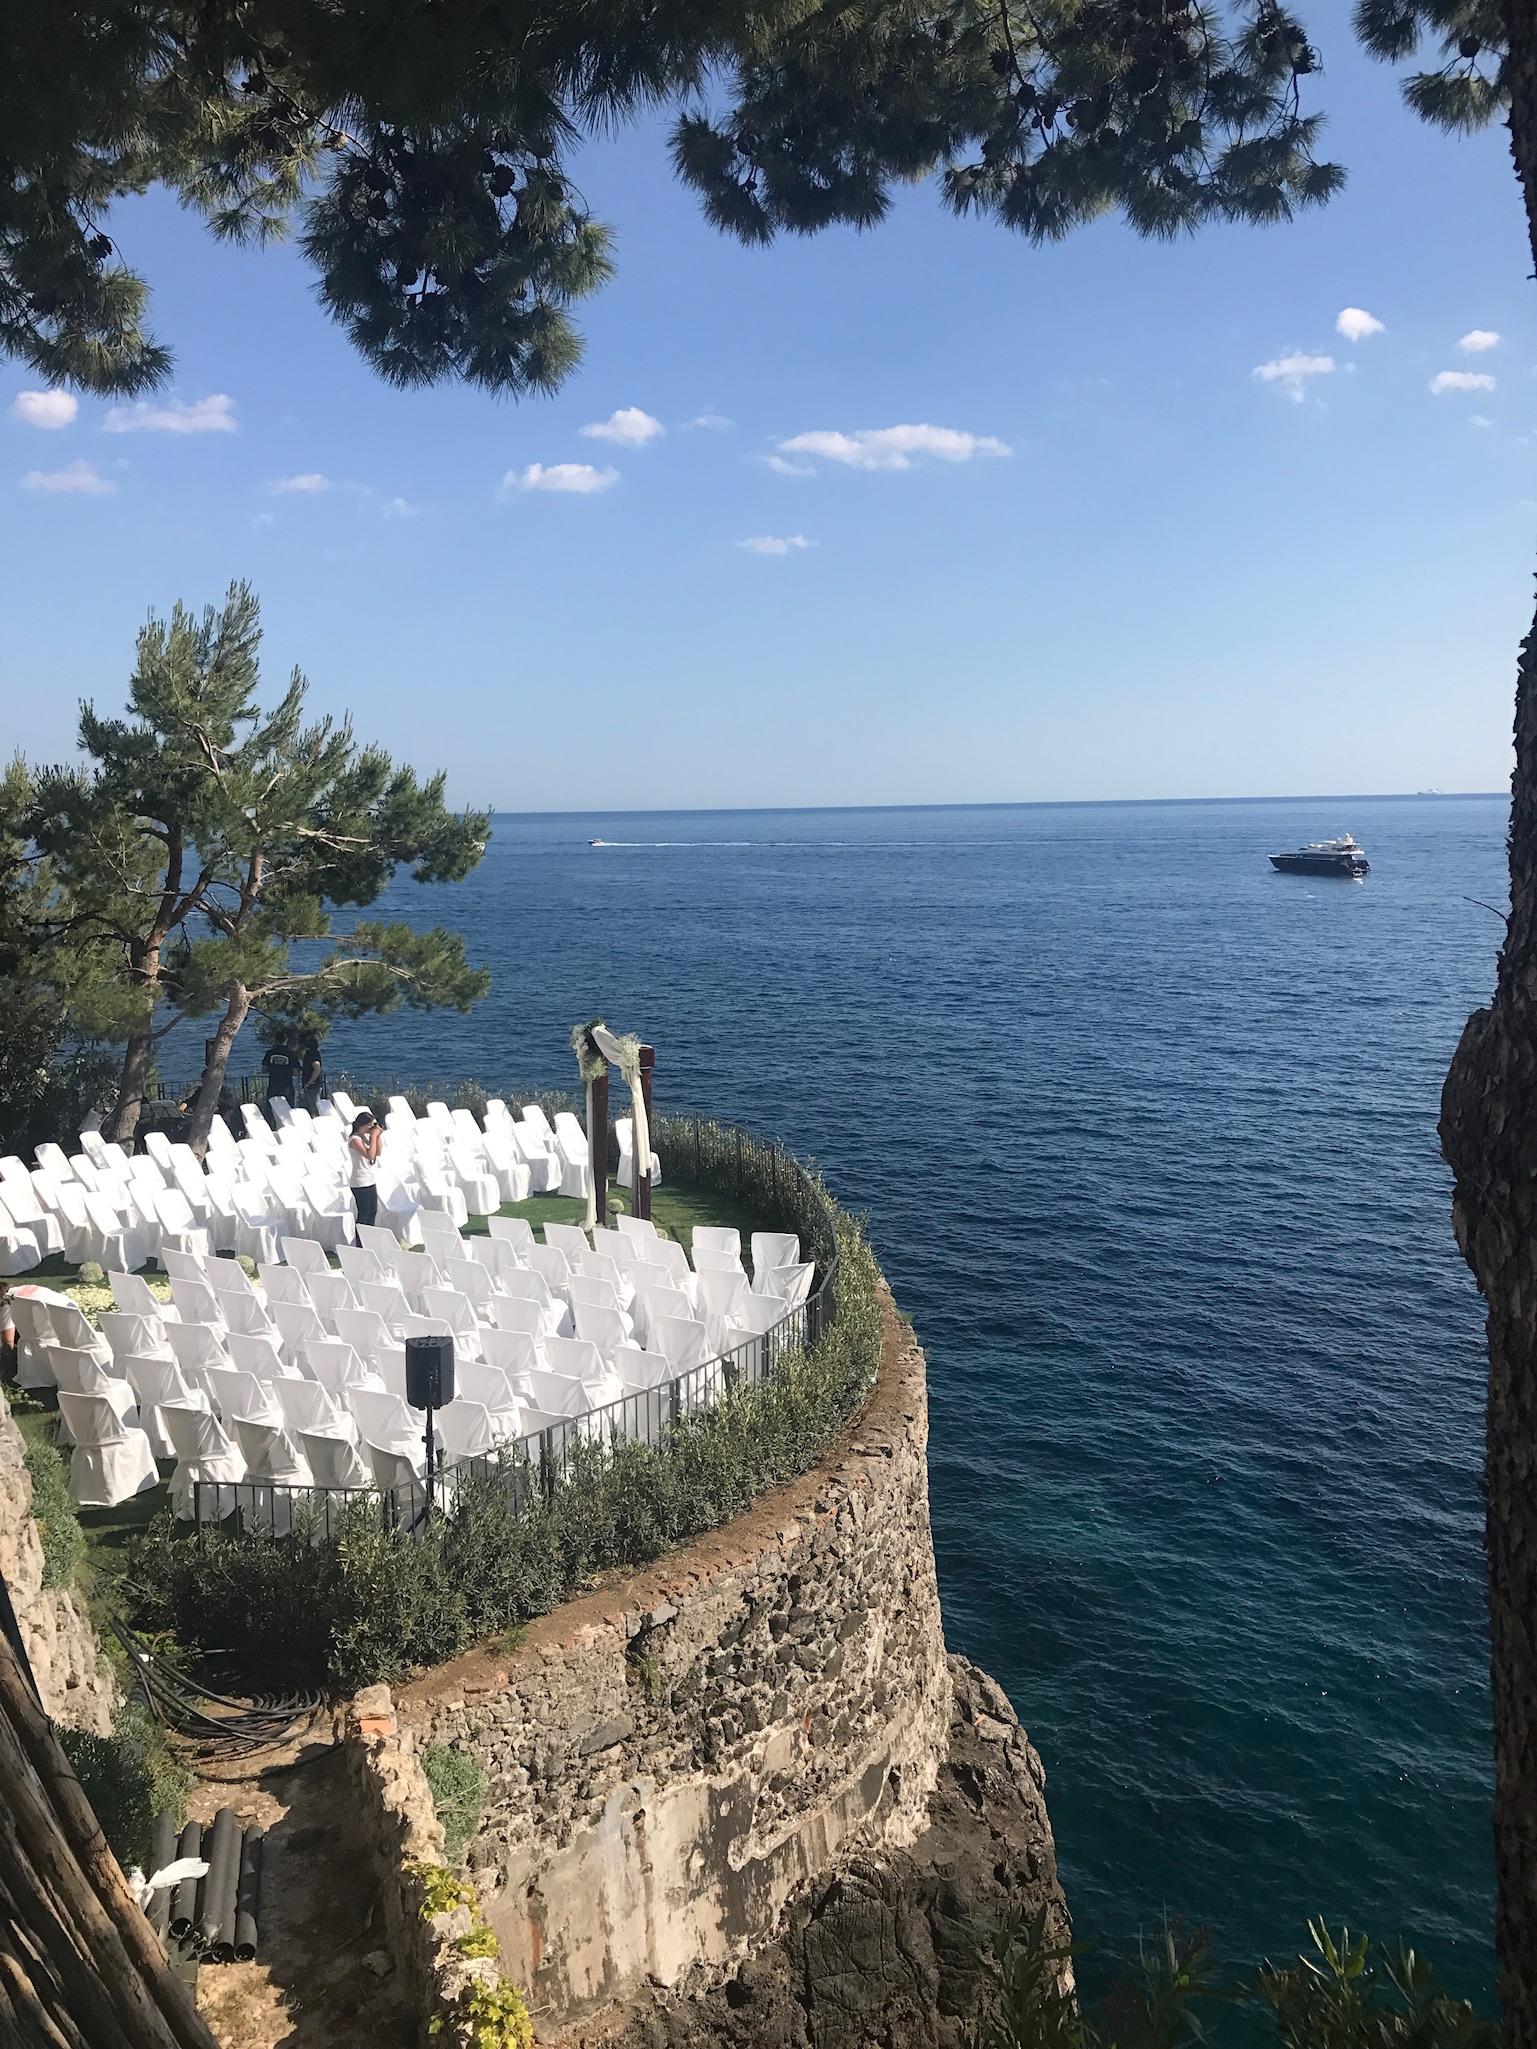 https://www.weddingamalfi.com/wp-content/uploads/Nathalie-and-Benjamin-Wedding-in-Positano-Italy-1.jpg